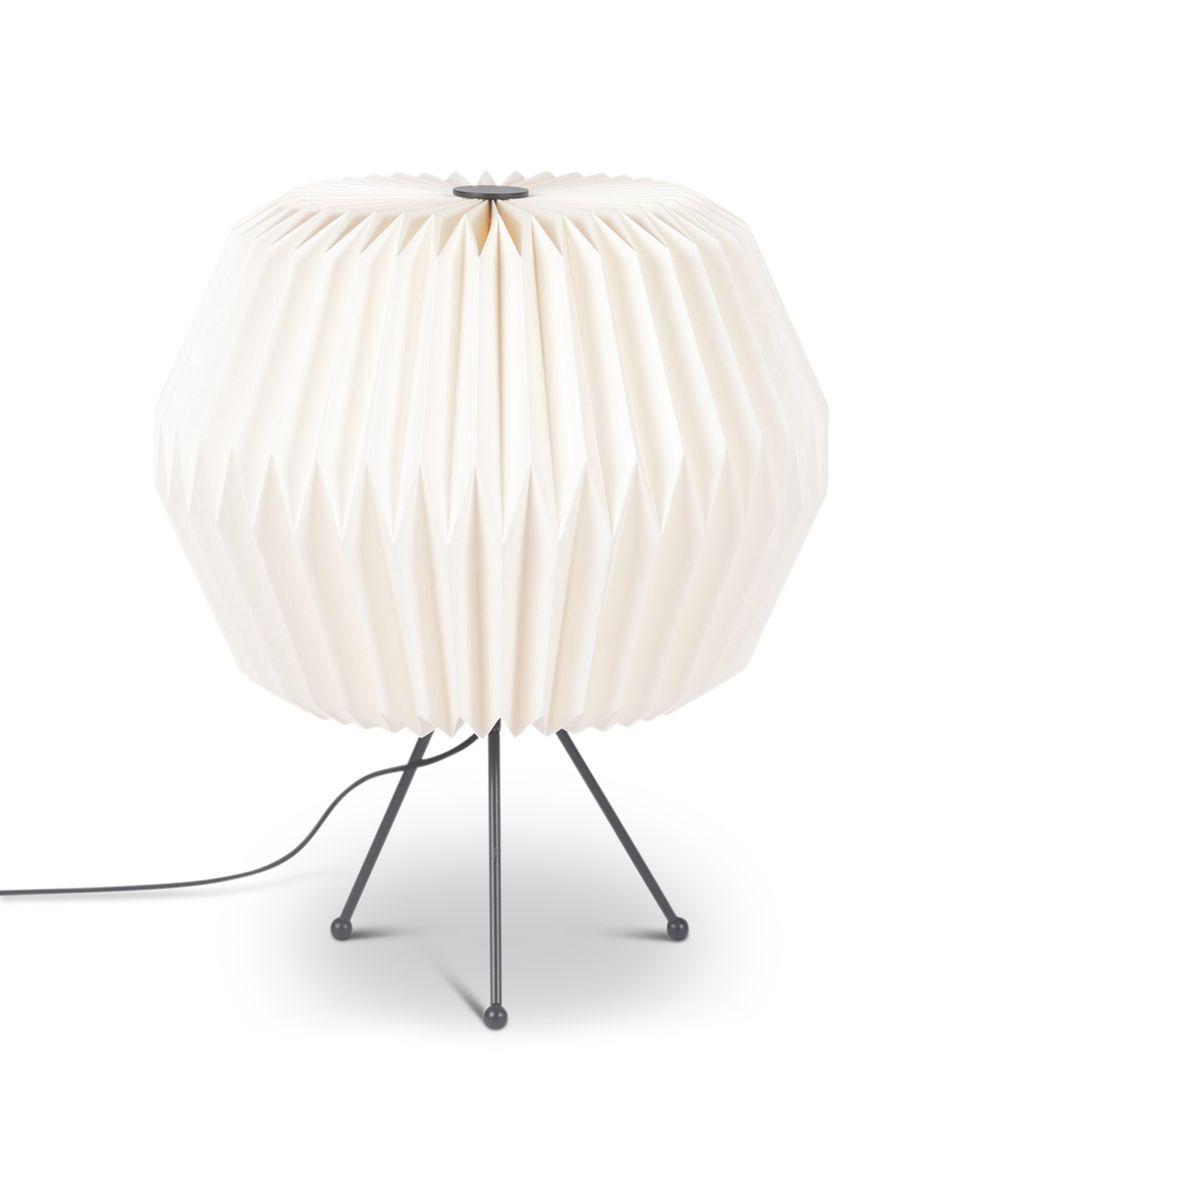 Lampe en papier origami blanche ronde